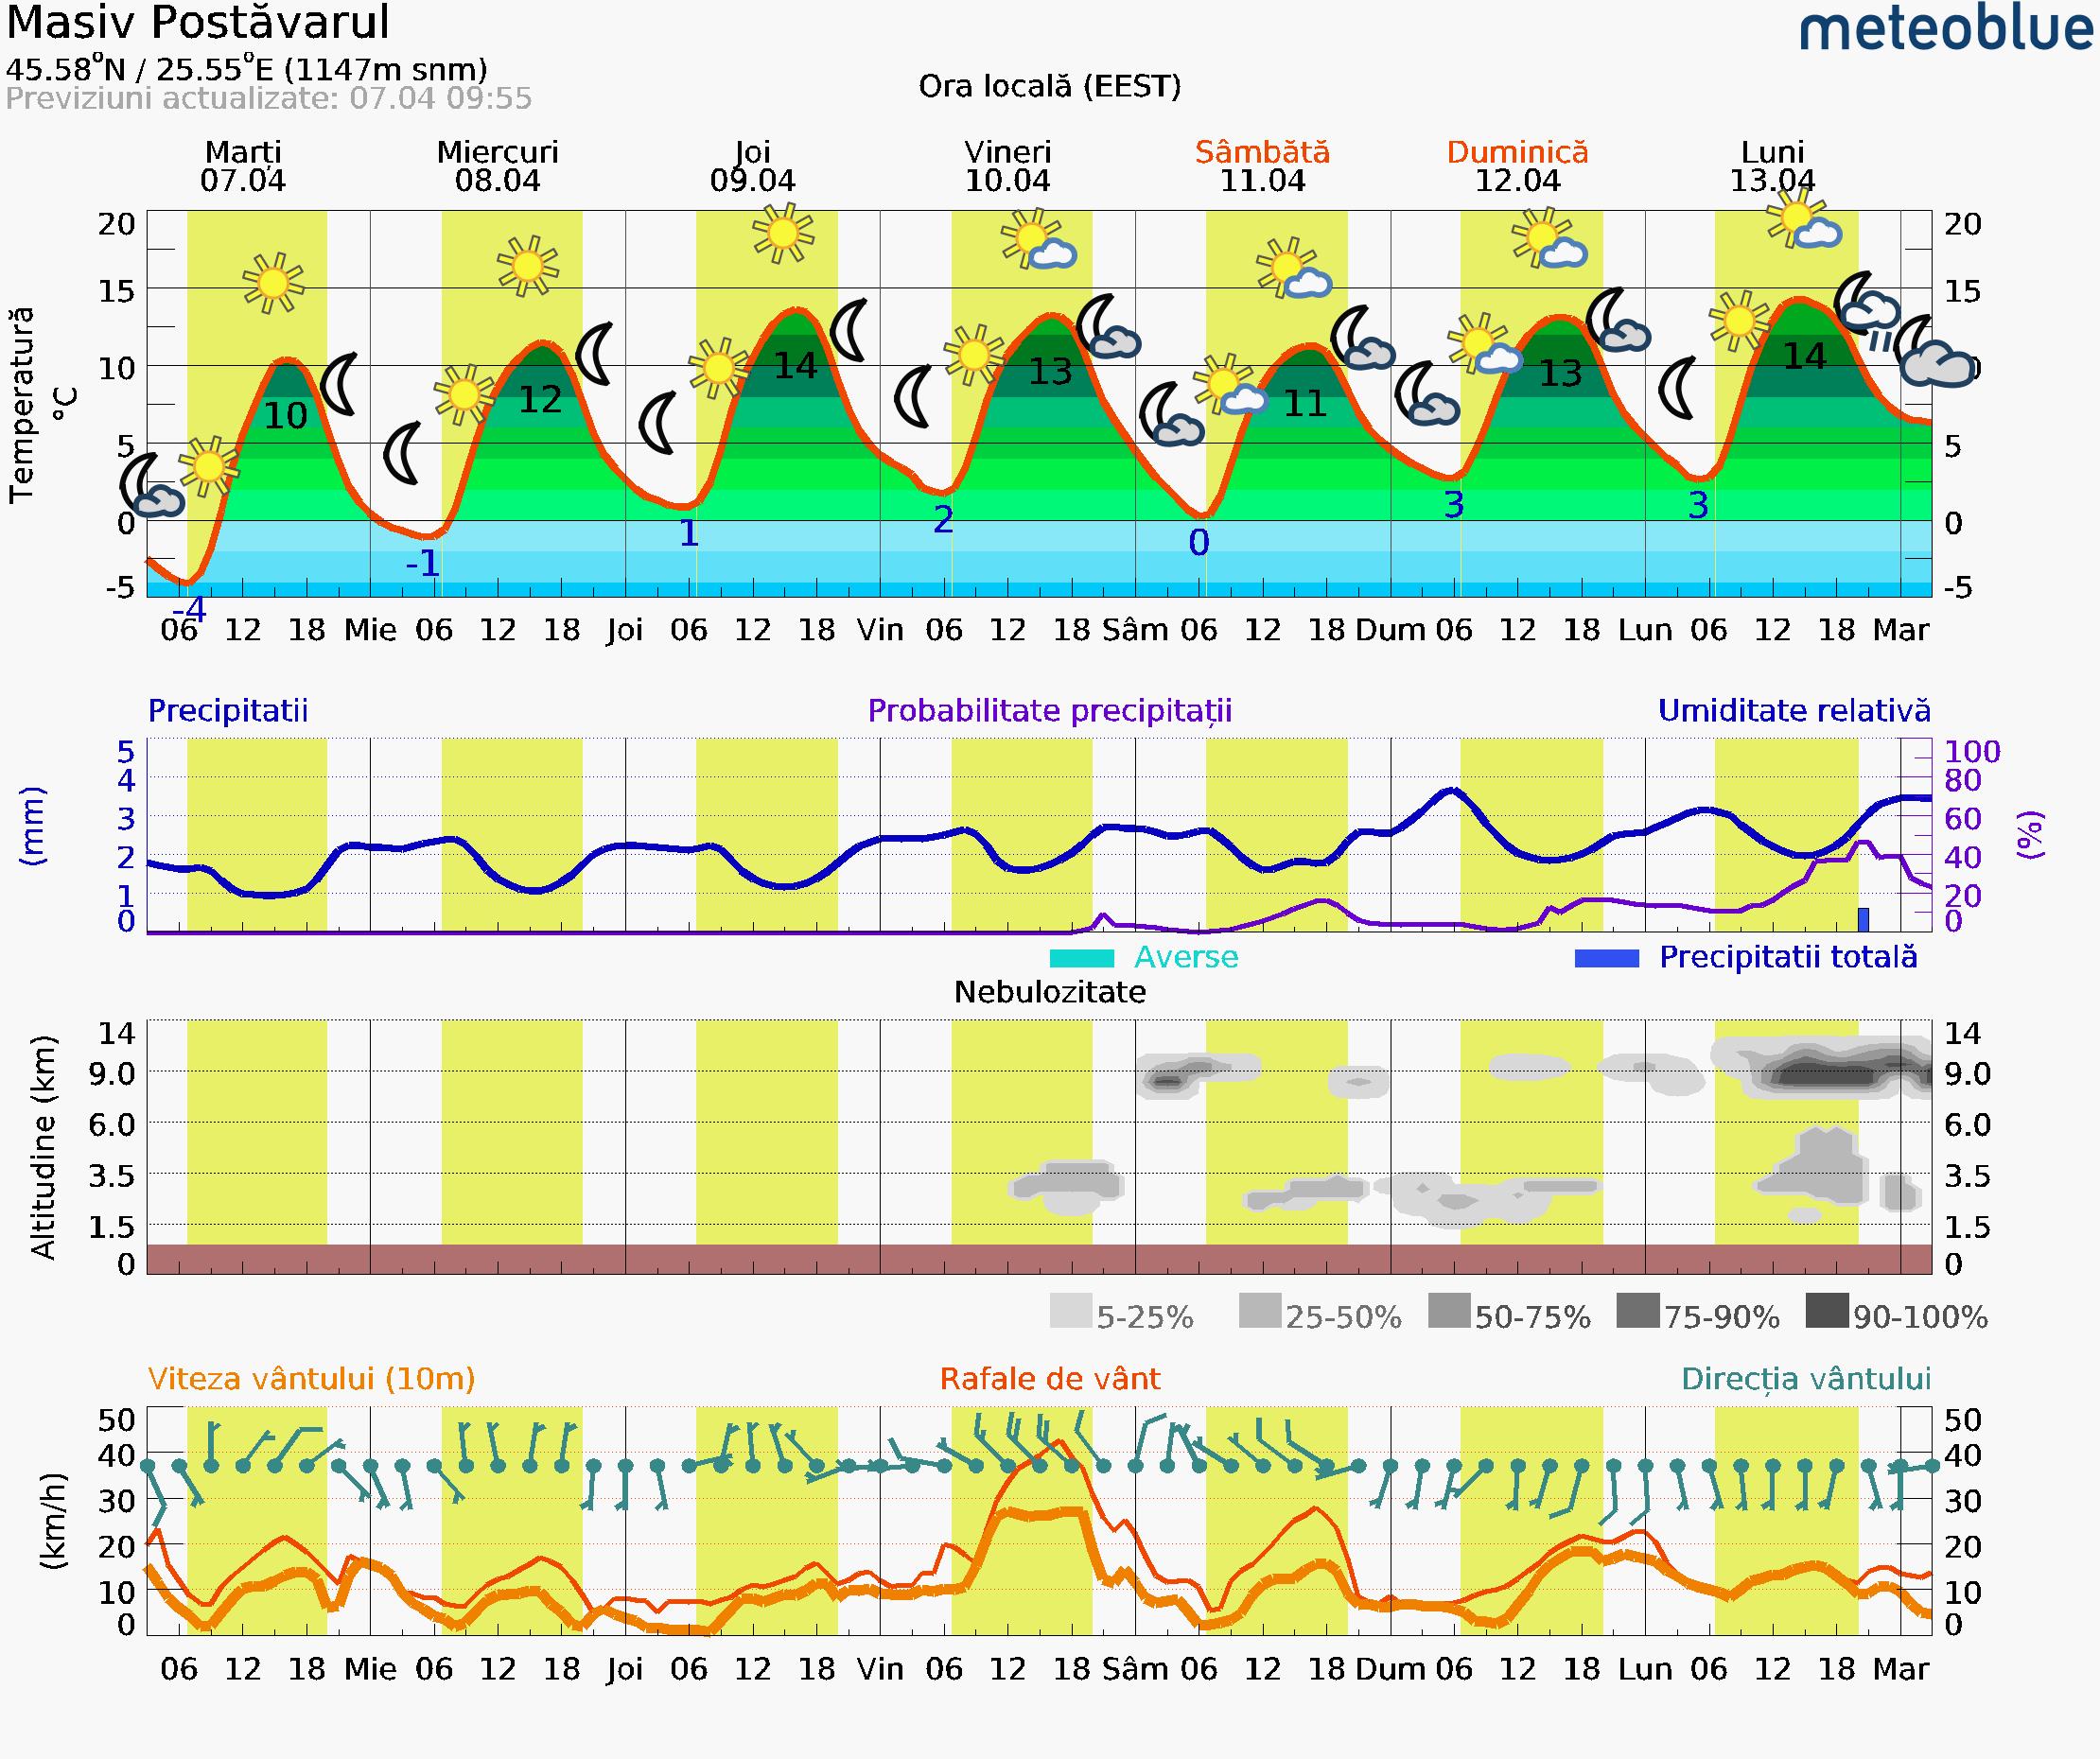 Prognoza vreme Masivul Postavarul, Poiana Brasov si Bucuresti #vremea #Romania #Carpathian (Poiana Brasov ski resort Romania)